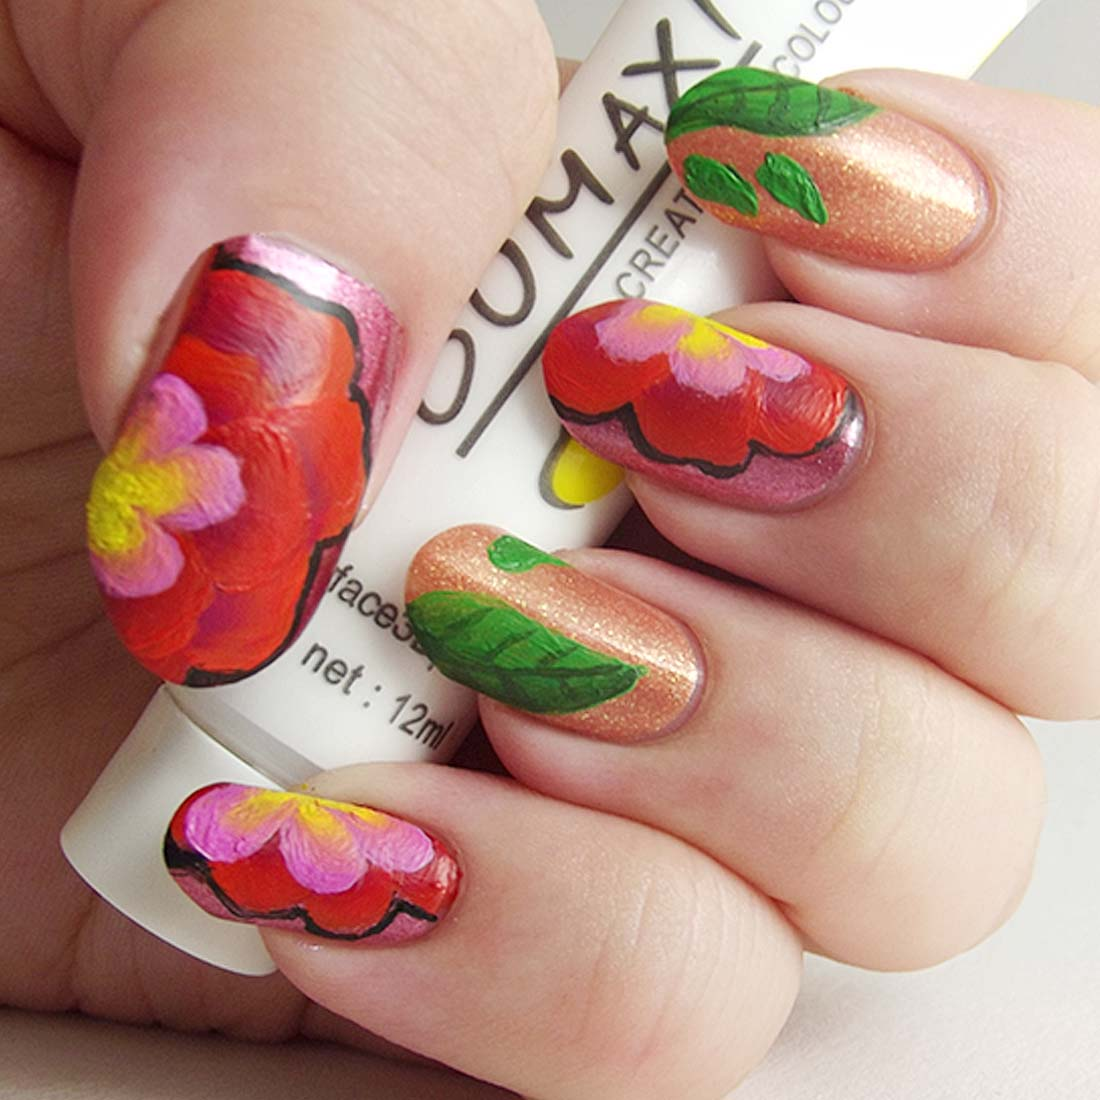 Creative Nail Art: BMC Creative Nail Art Gel Polish Acrylic Manicure Paint